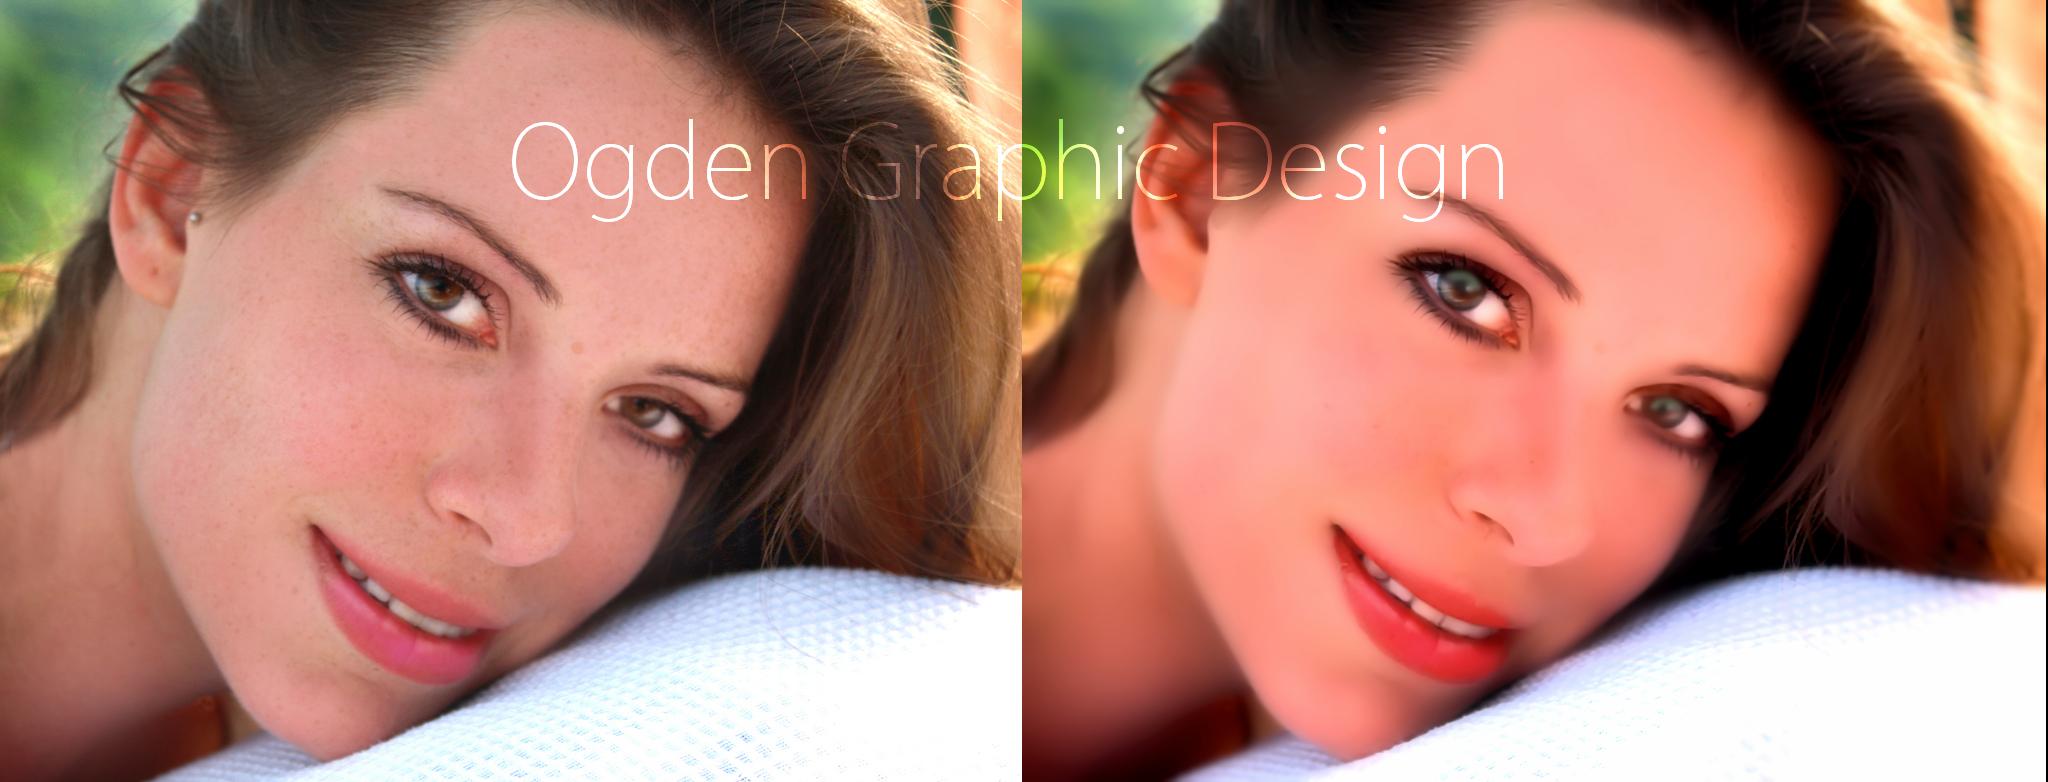 Ogden Graphics